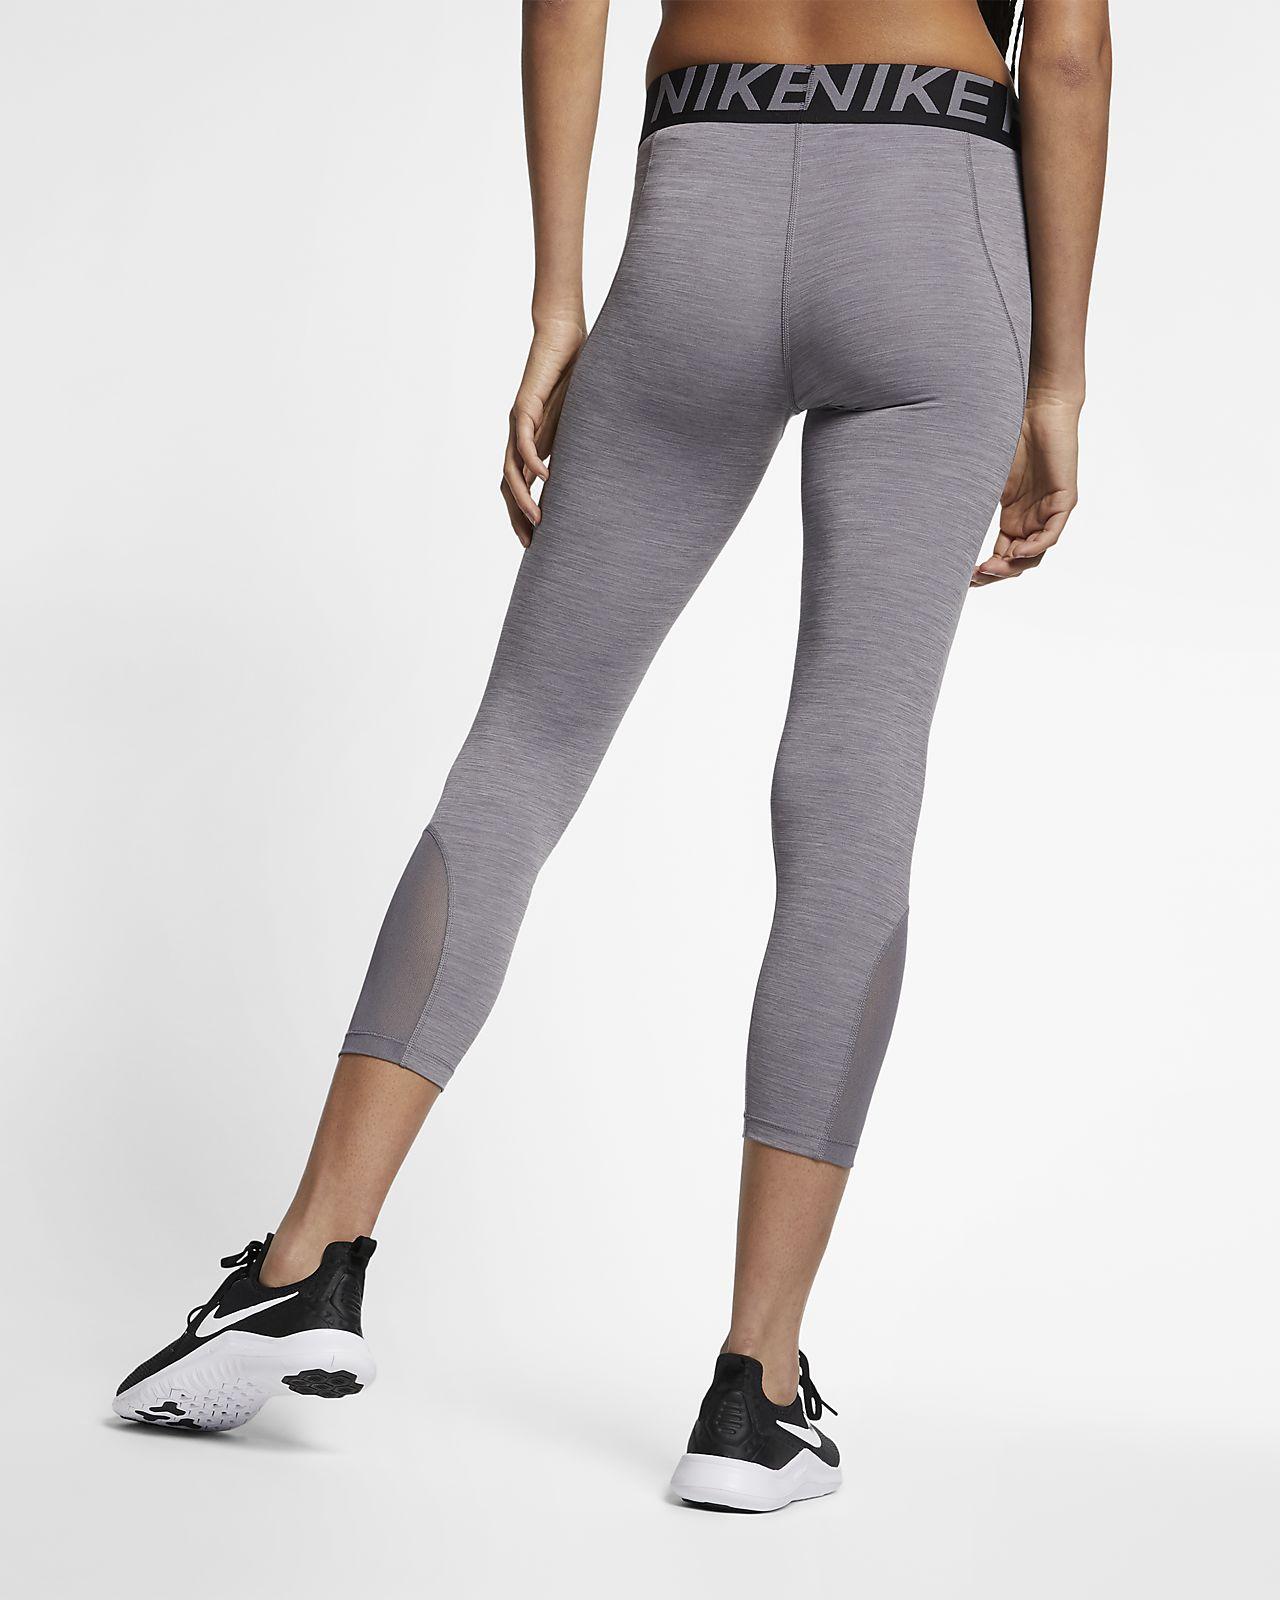 af2dc756ddc130 Nike Pro Women's 7/8 Tights. Nike.com